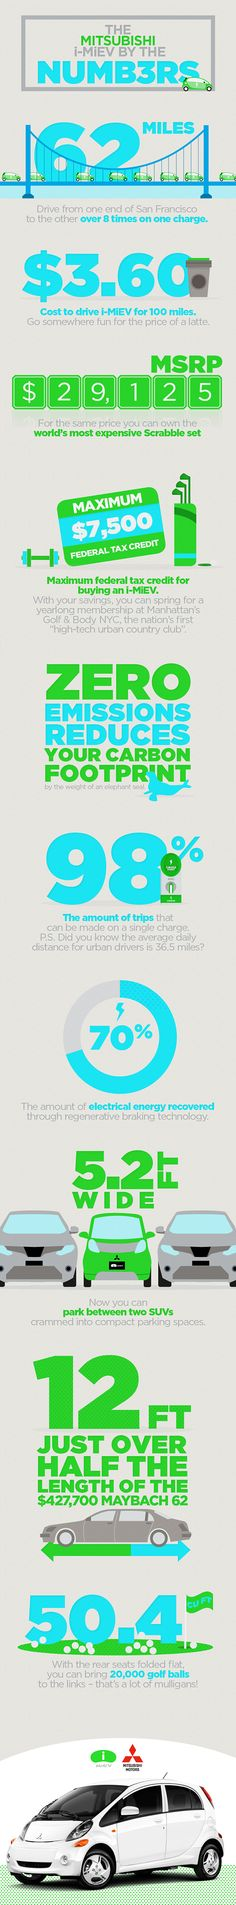 Mitsubishi Motors i-MiEV // infographics on Behance